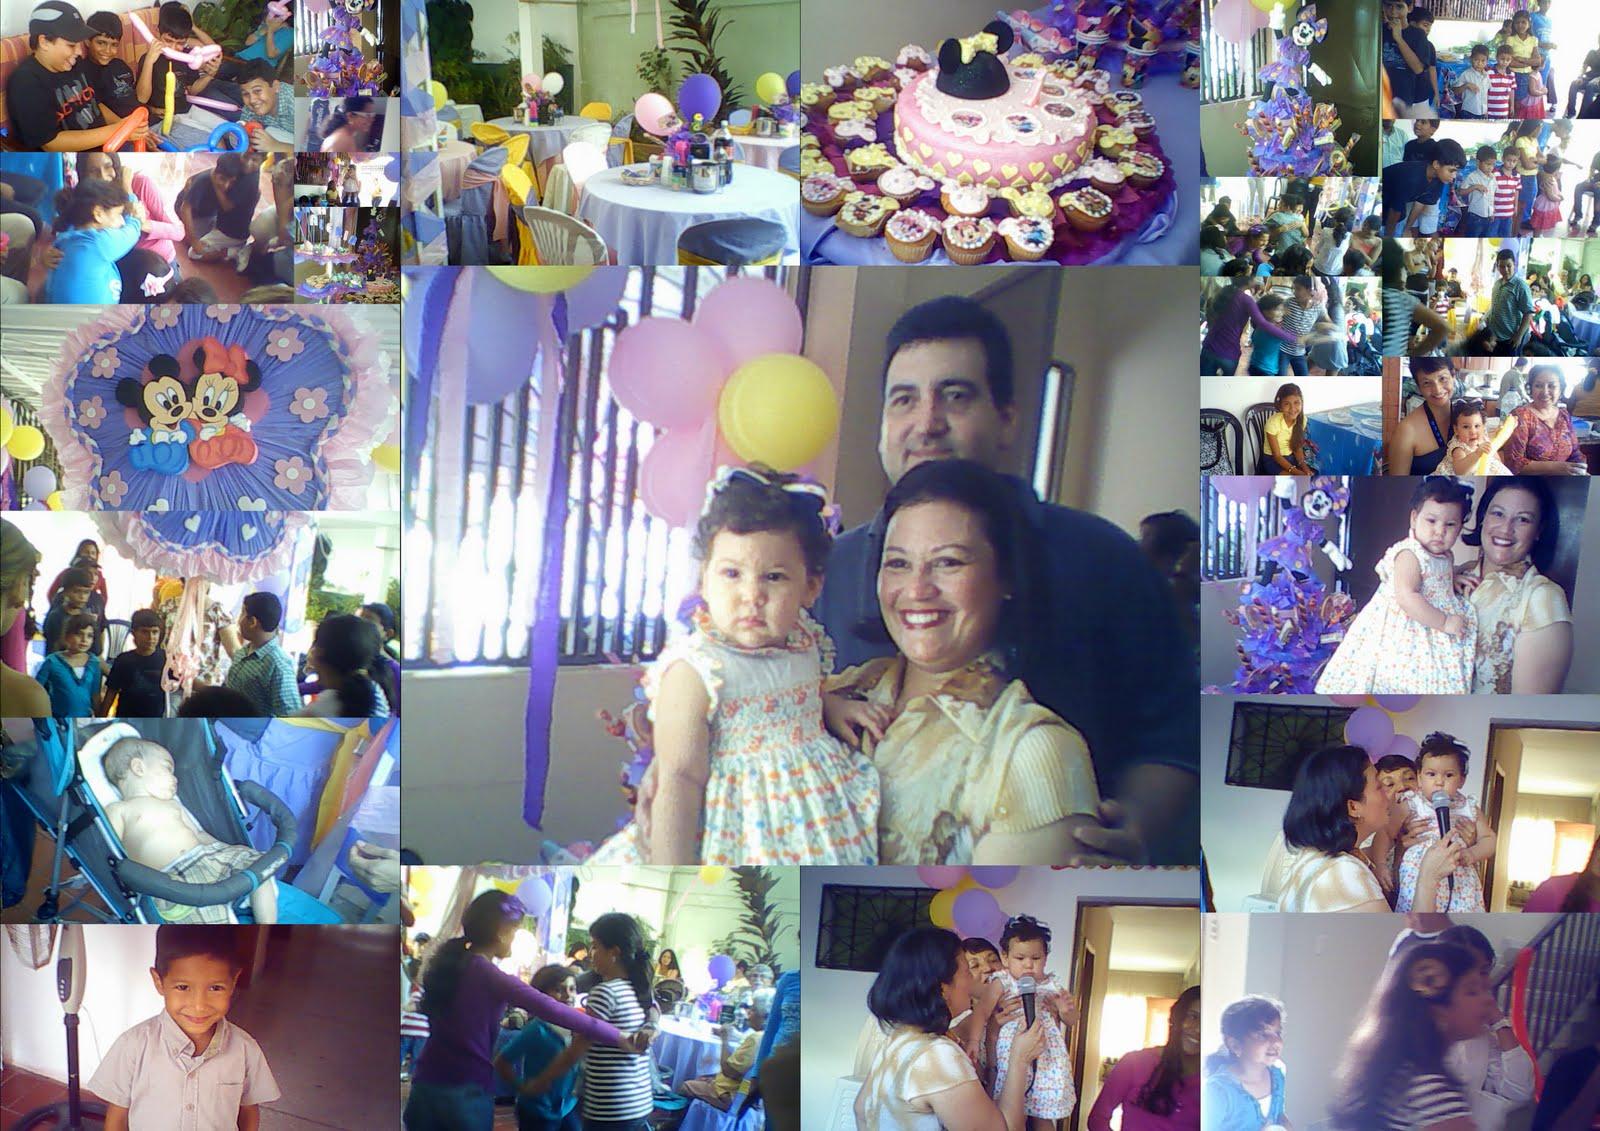 Cumpleaños de ANA VALERIA SOLIS SANCHEZ